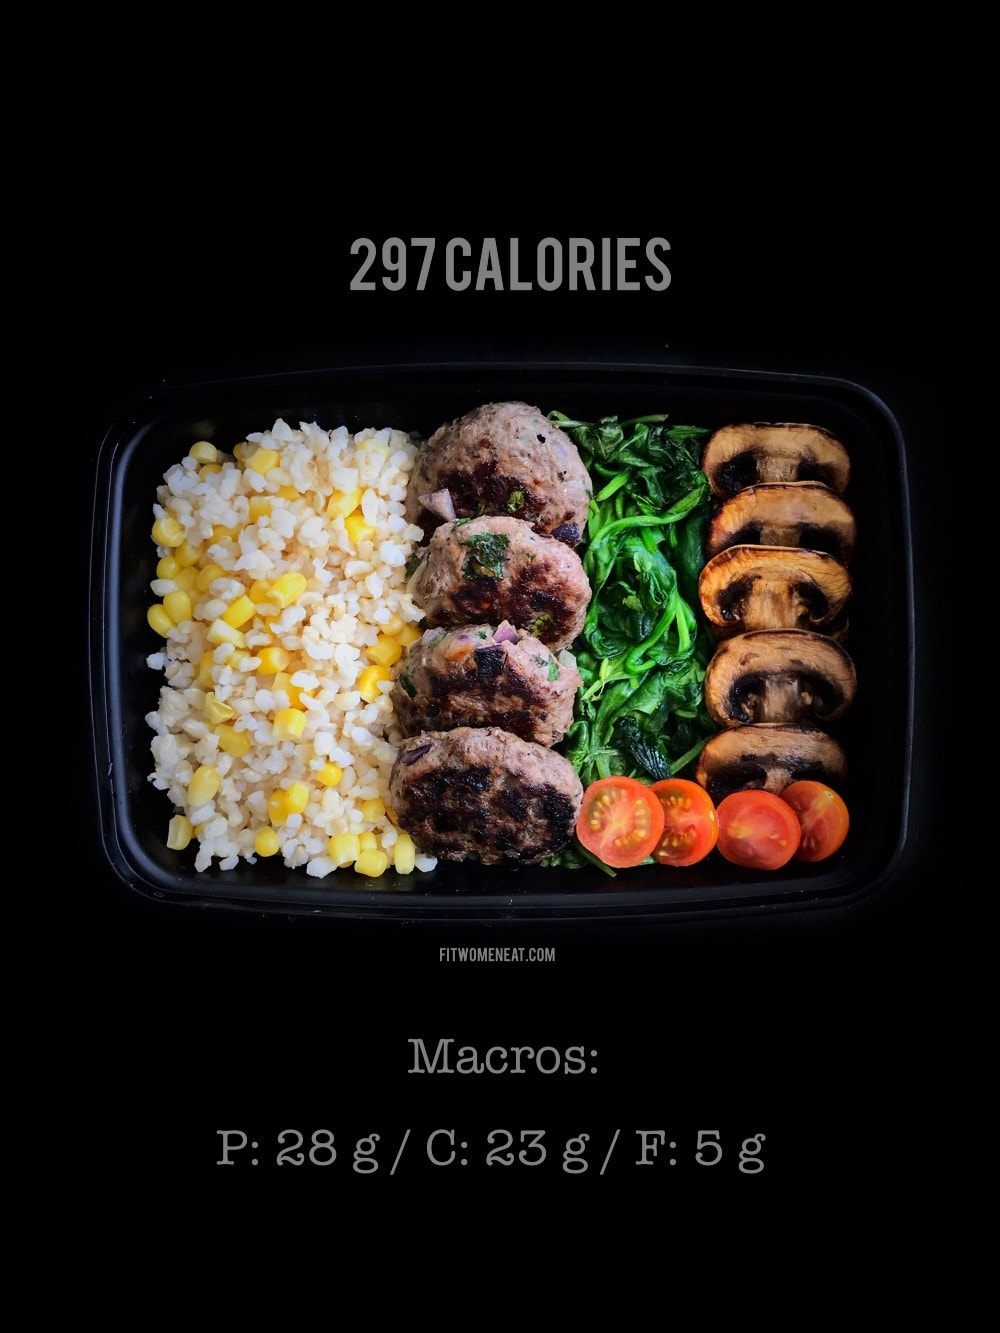 Beef Patties-Sweet Corn Rice and Sautéed Veggies